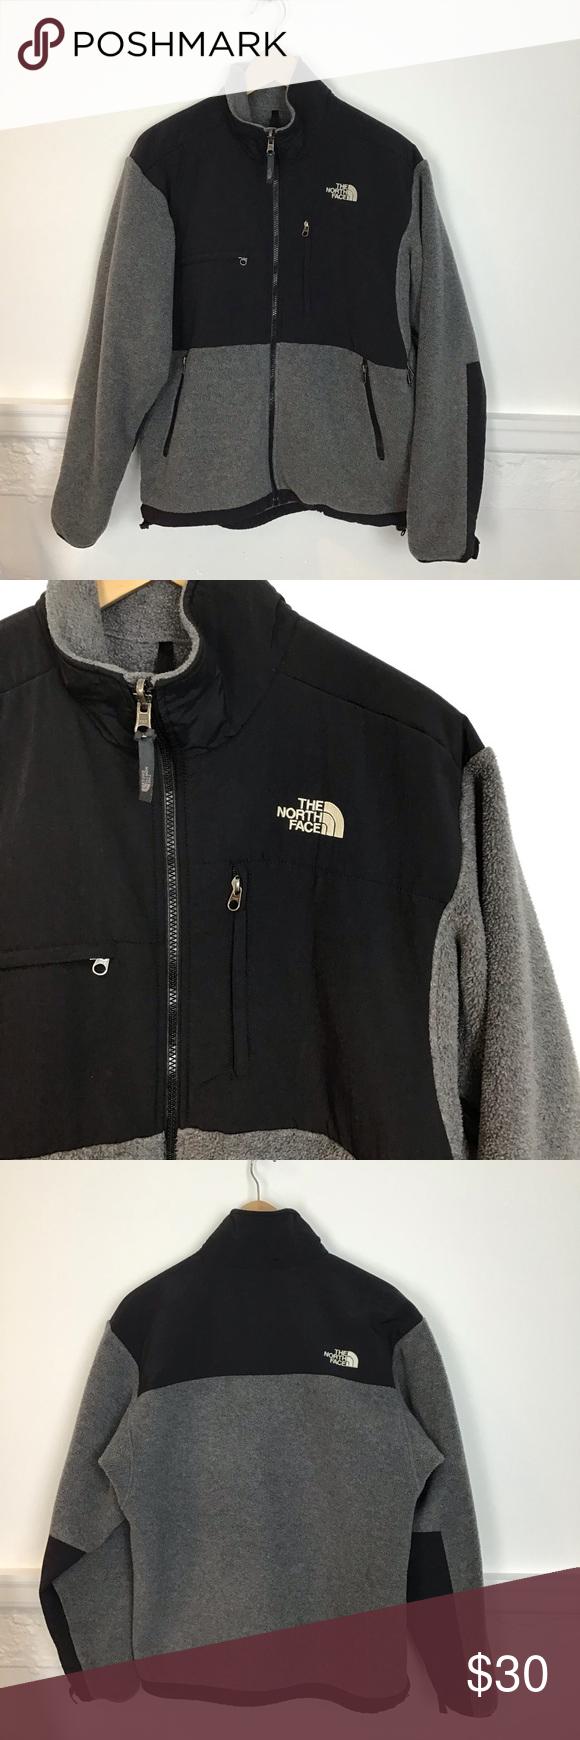 North Face Denali Fleece Jacket Classic North Face Denali Jacket Size Tag Is Missing I Believe It S A Medium Please Fleece Jacket Jackets The North Face [ 1740 x 580 Pixel ]